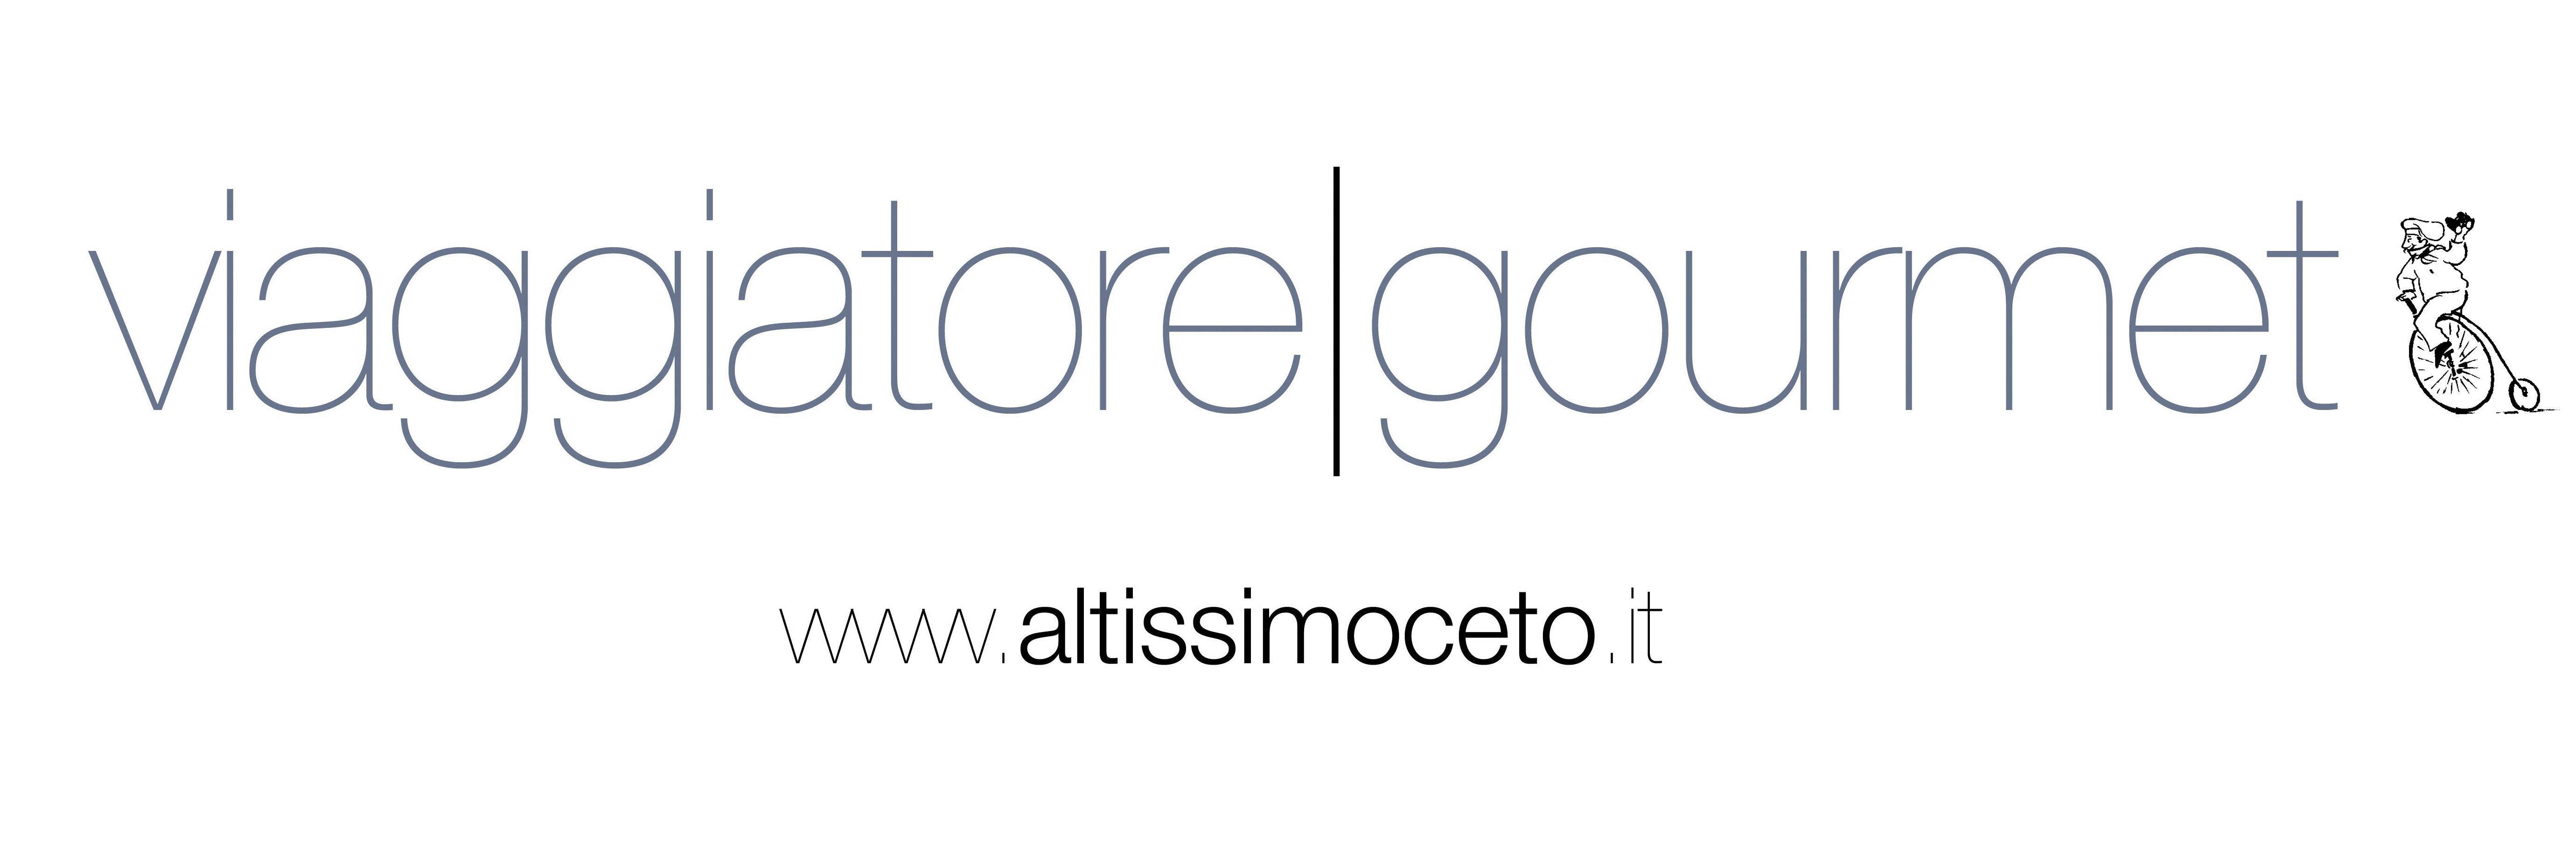 https://www.altissimoceto.it/Image/Awards2011/logoOK_negativo.jpg